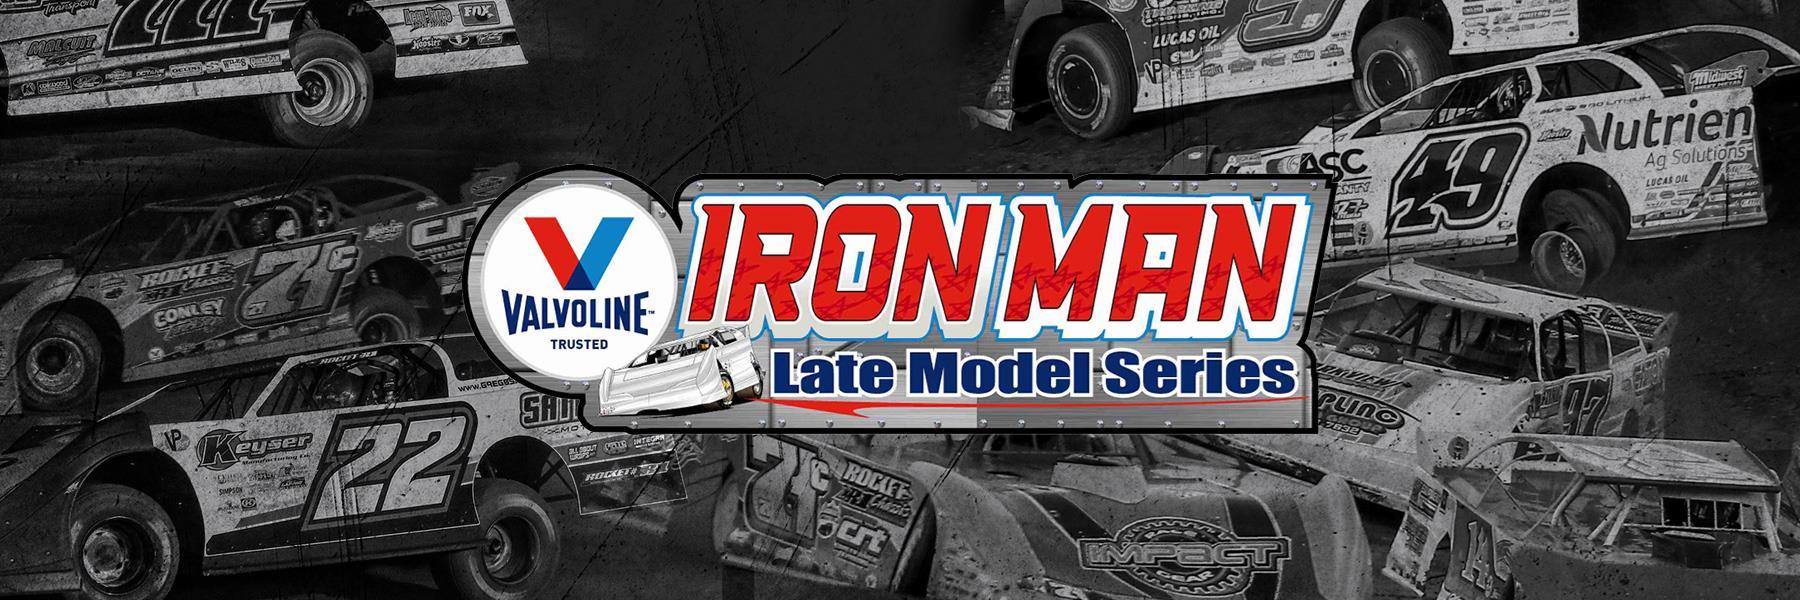 Iron-Man Late Model Series